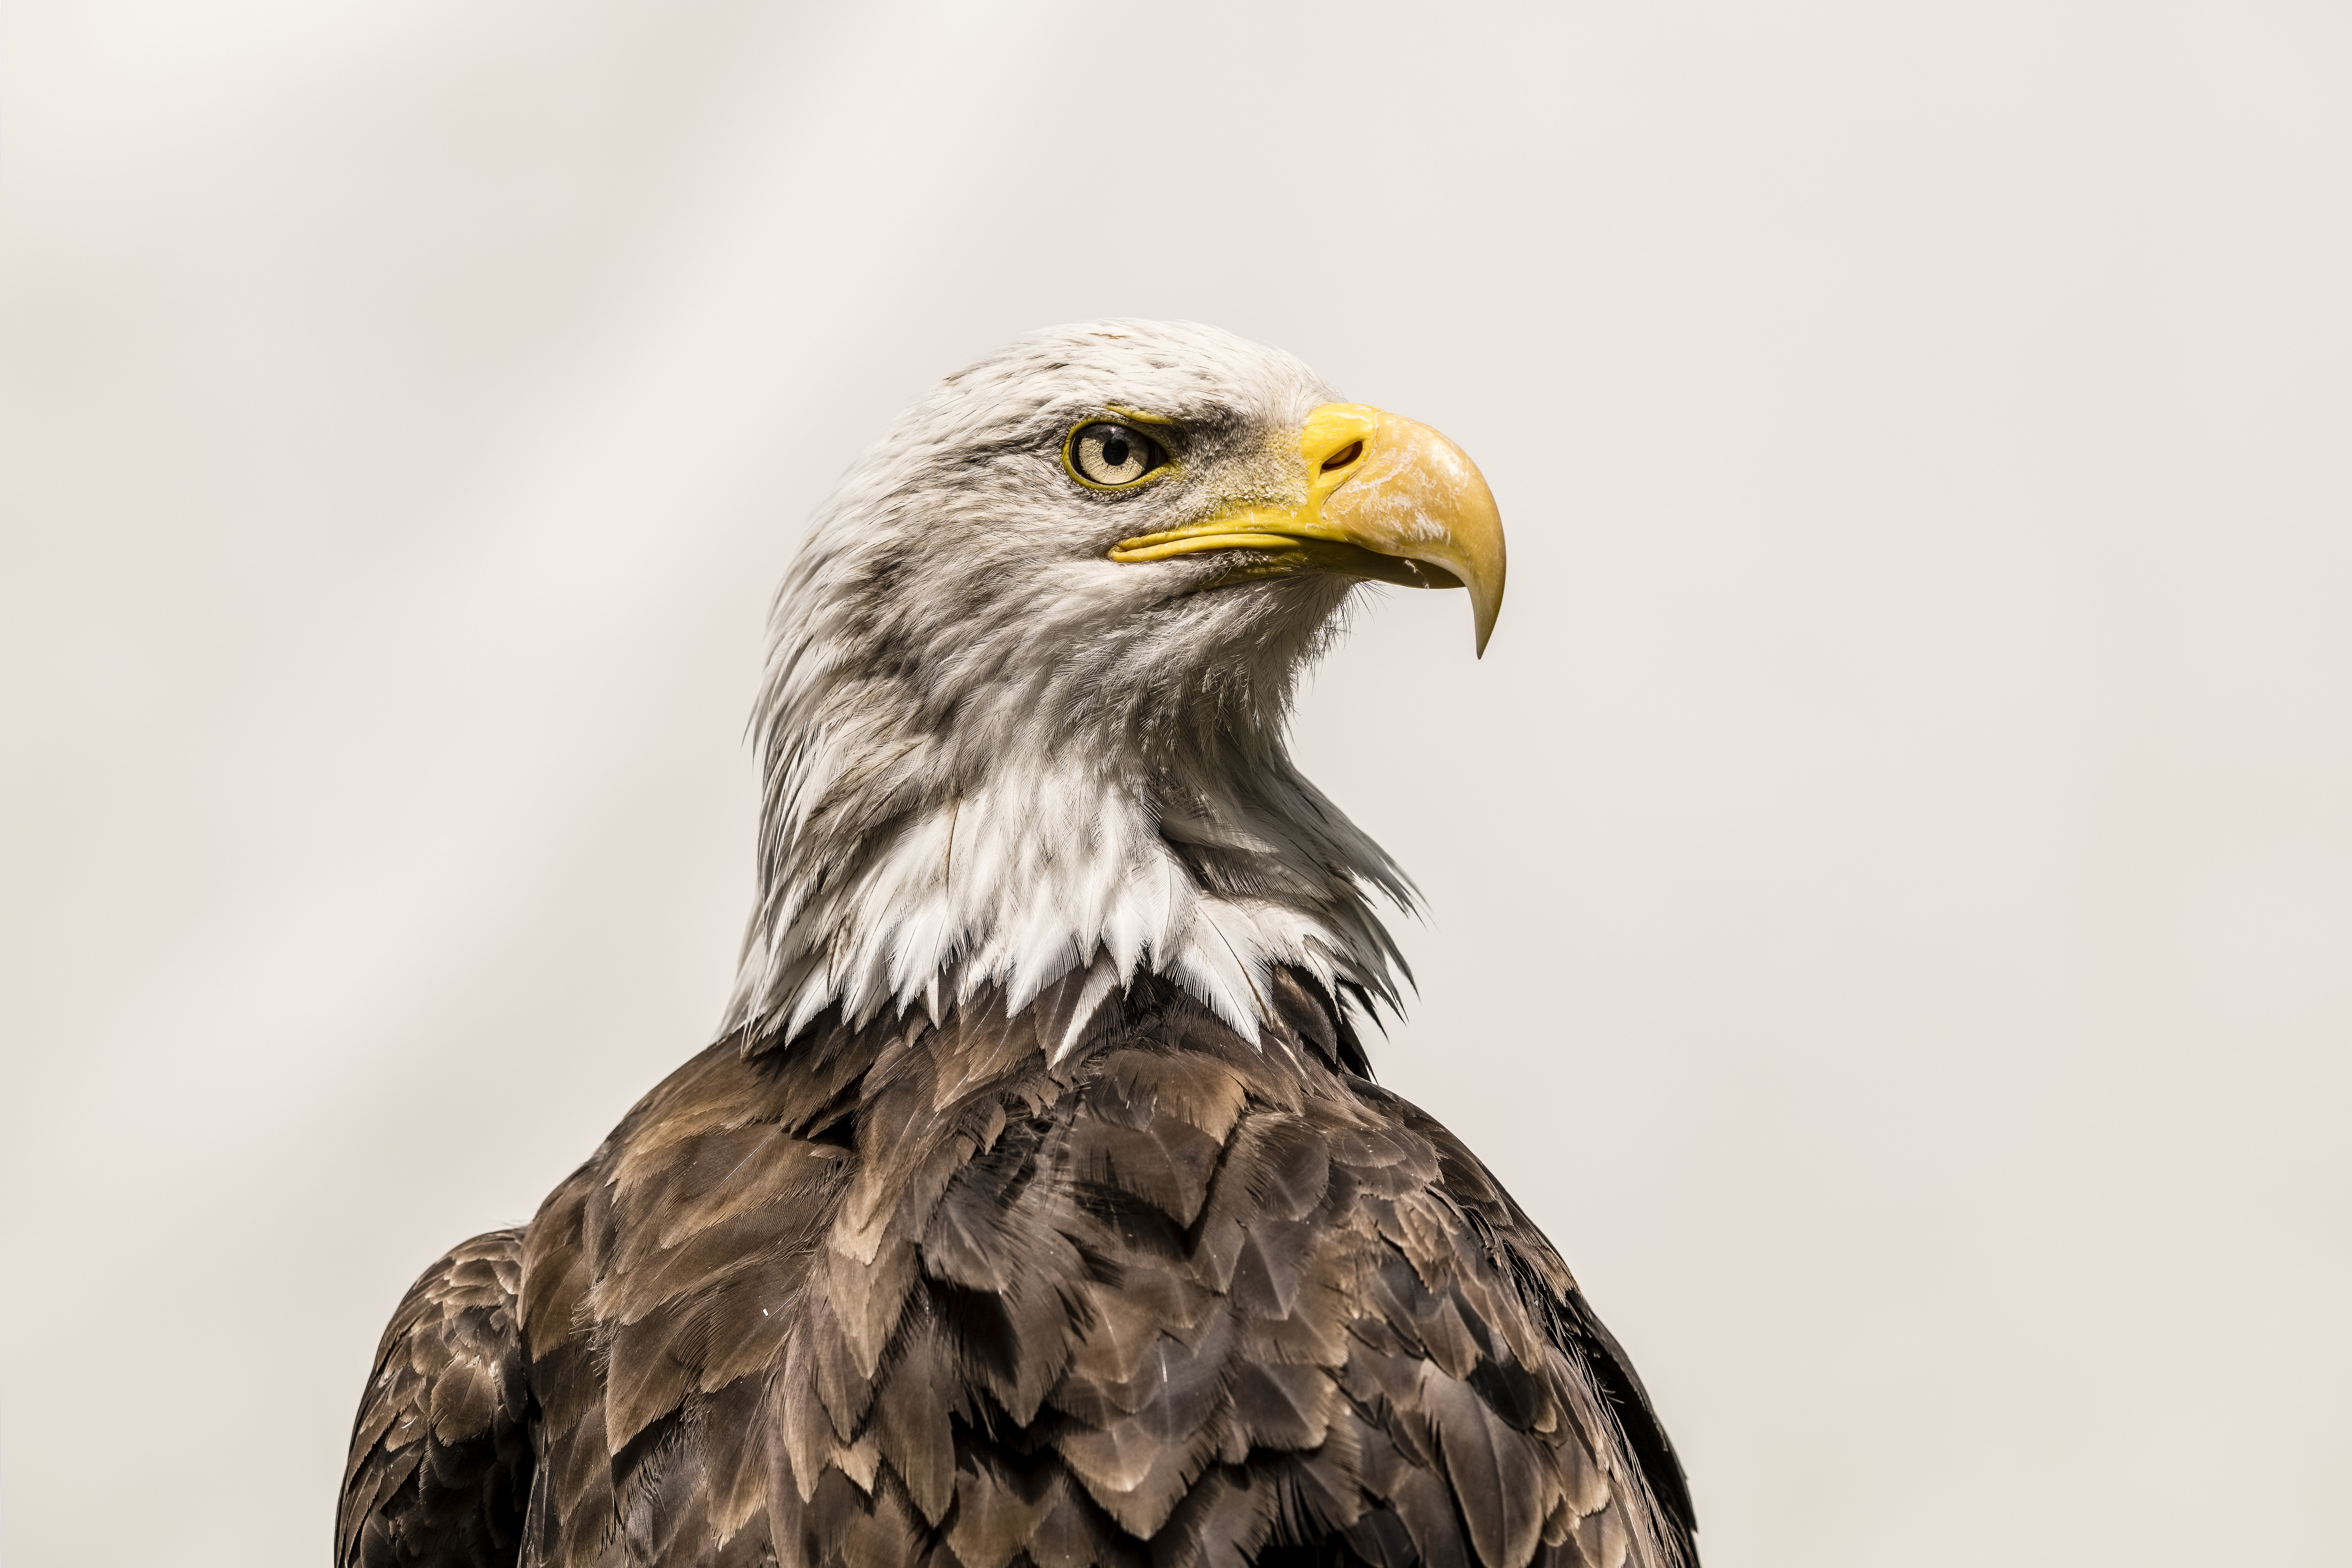 Close-up portrait of a Bald Eagle (Haliaeetus leucocephalus...